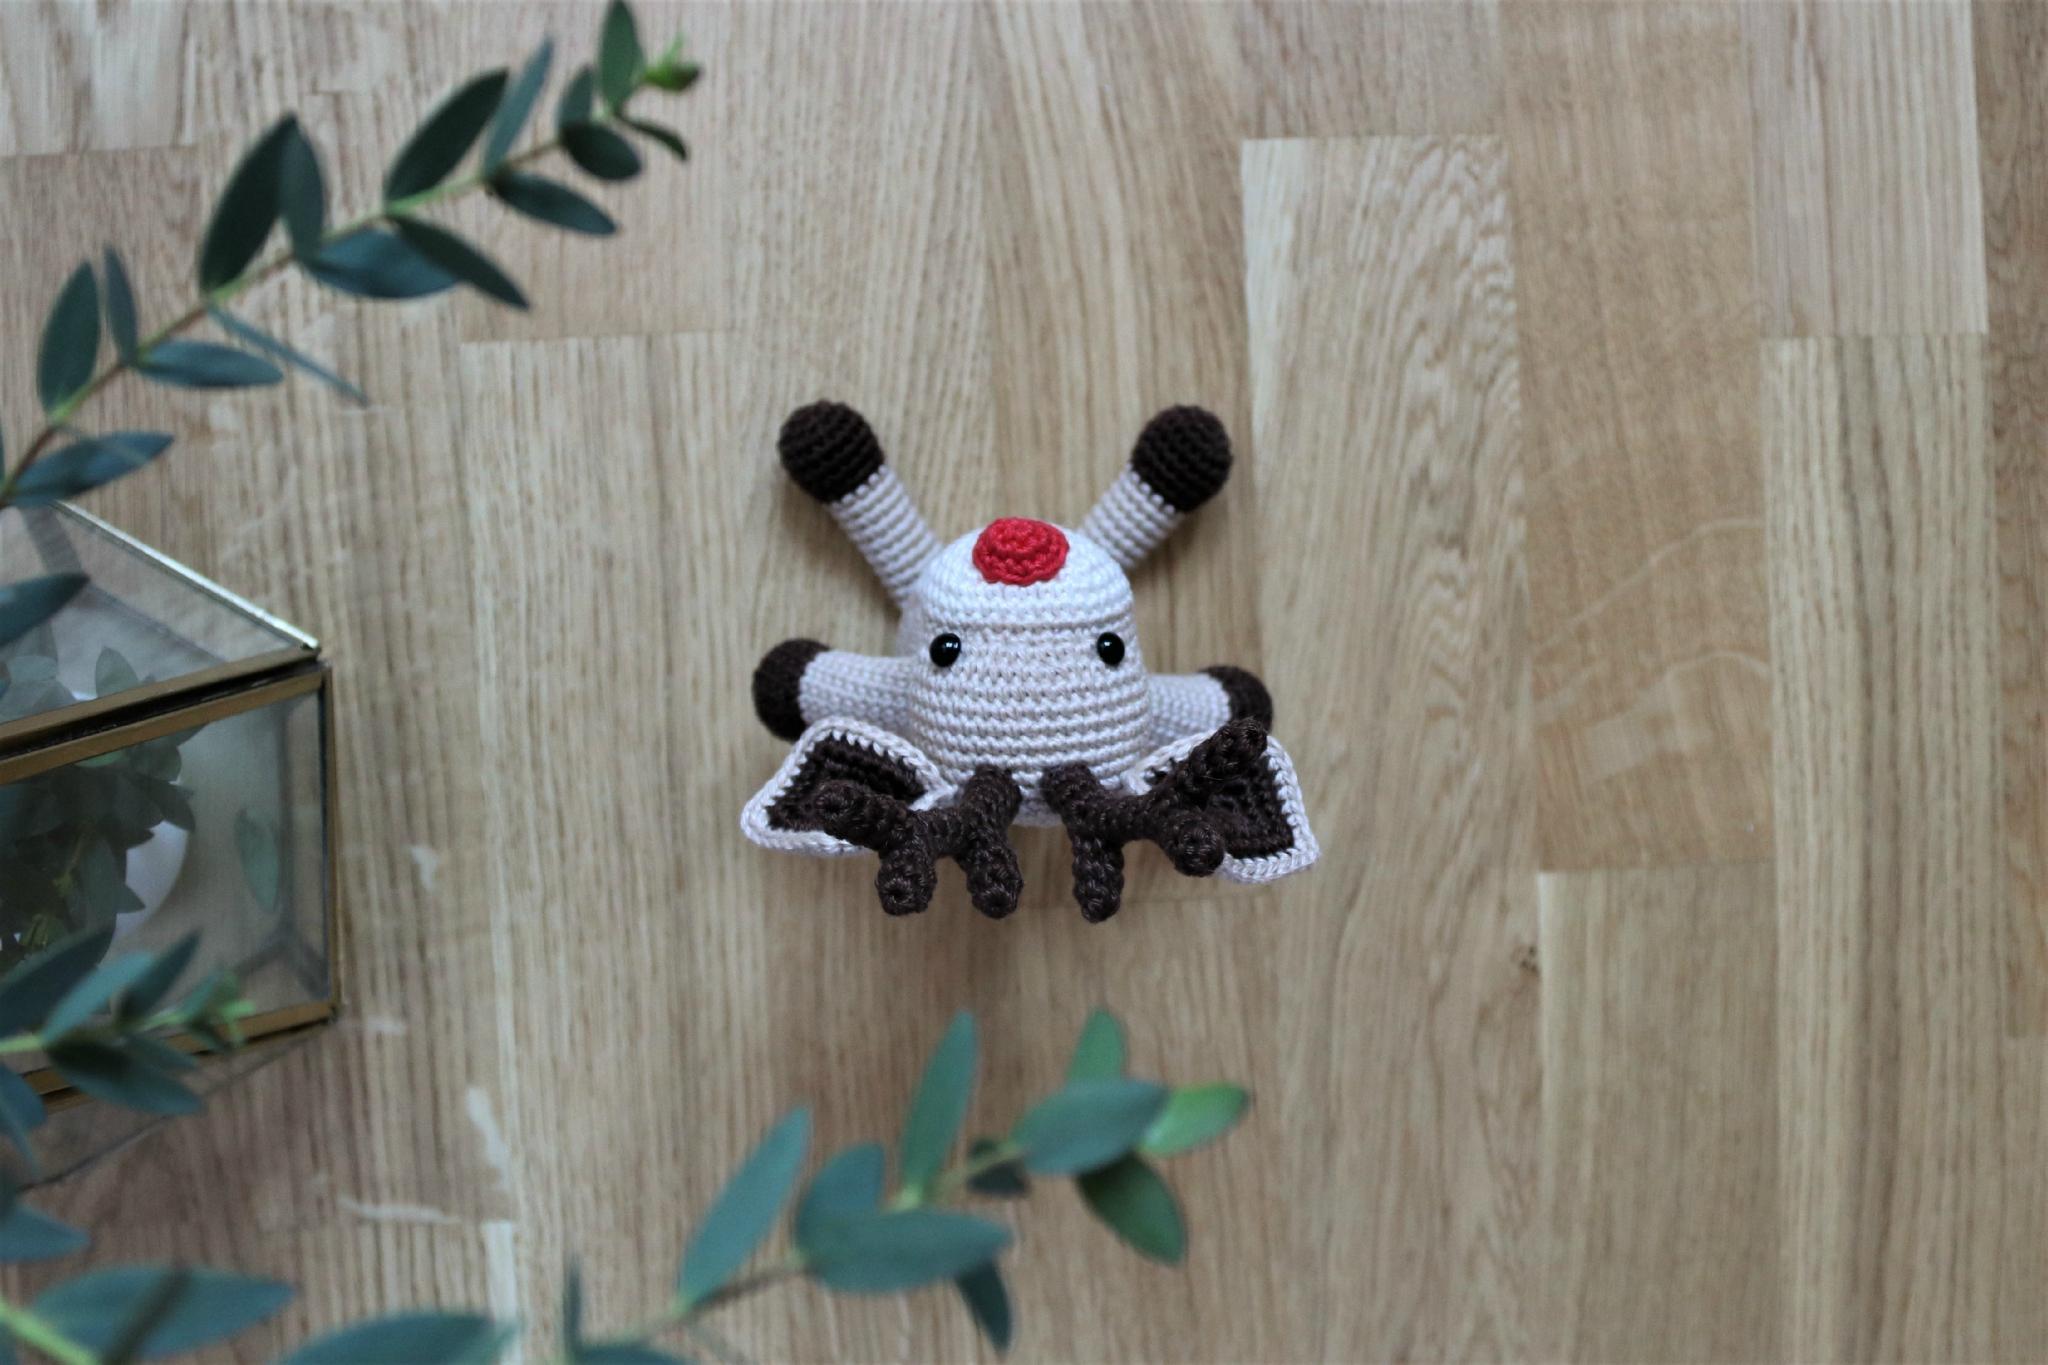 Rudolph, le petit renne au nez rouge - Mi fil, mi câlin